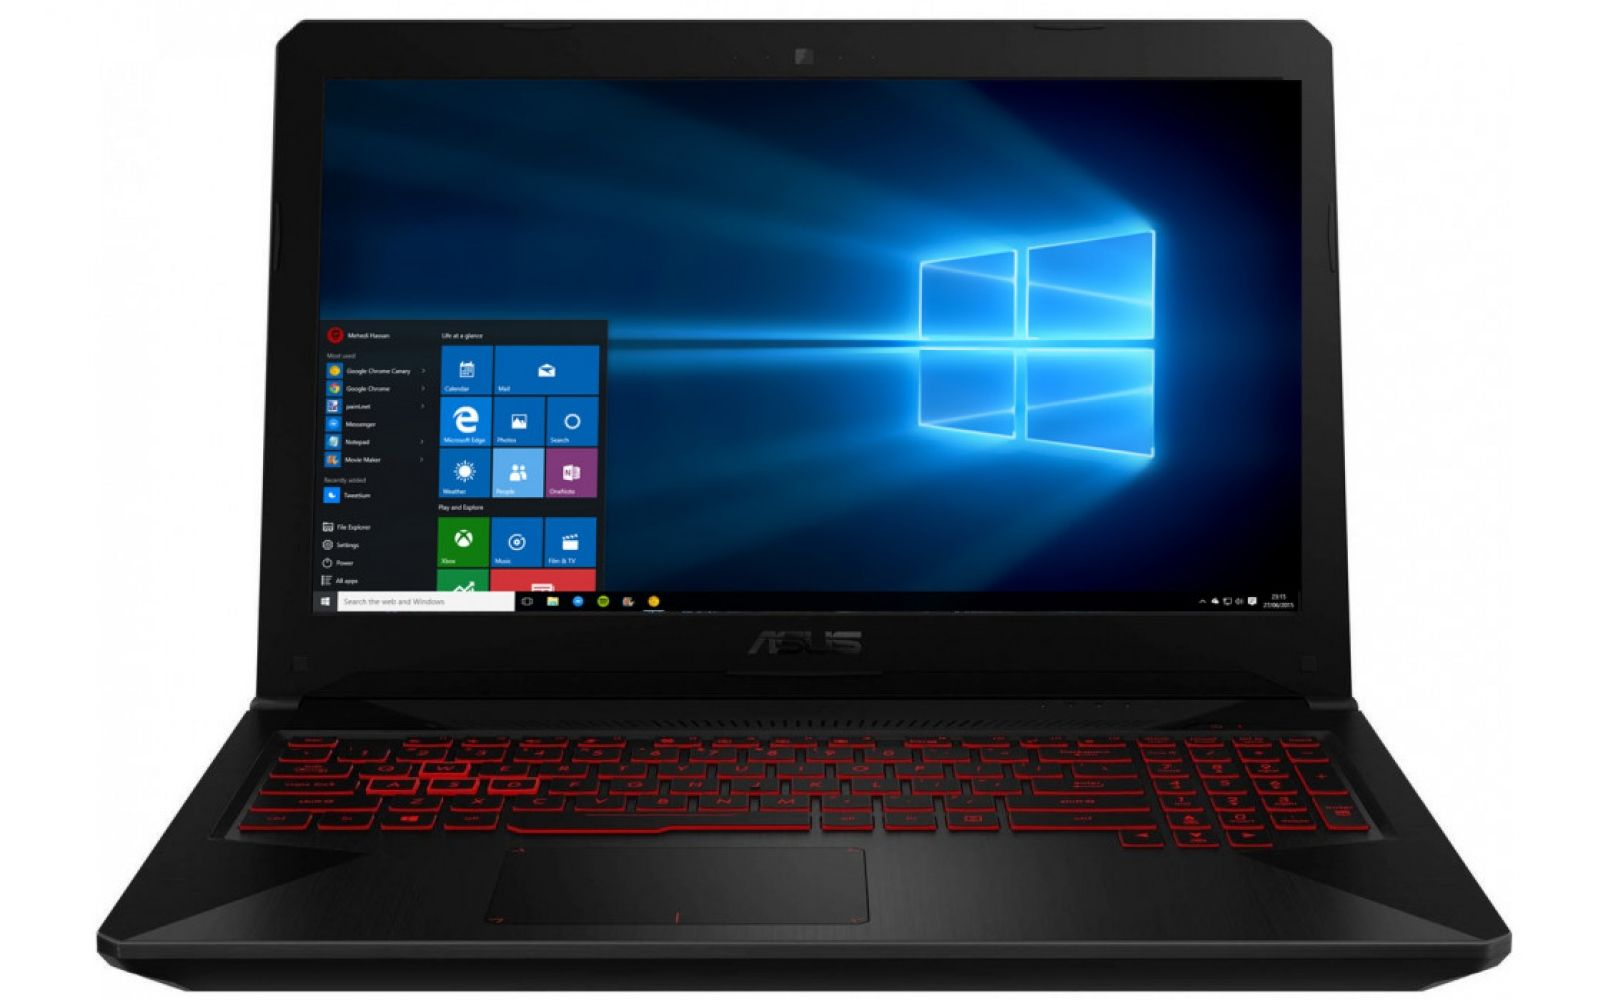 Купить Ноутбуки, Ноутбук ASUS TUF Gaming FX504GM-E4245 (90NR00Q2-M04870) Black/Red Pattern